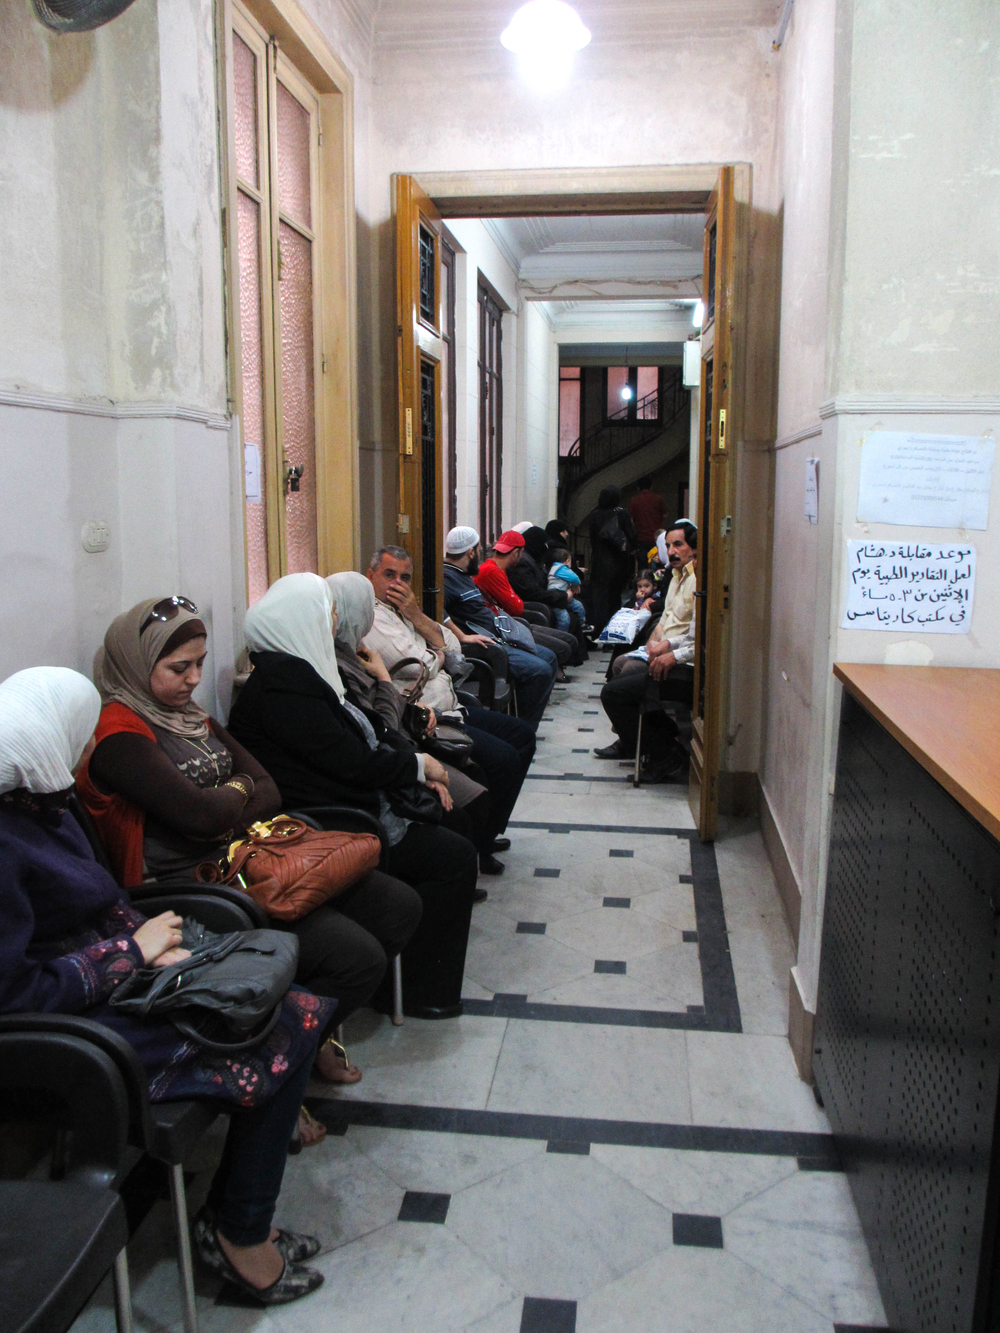 Caritas waiting area.